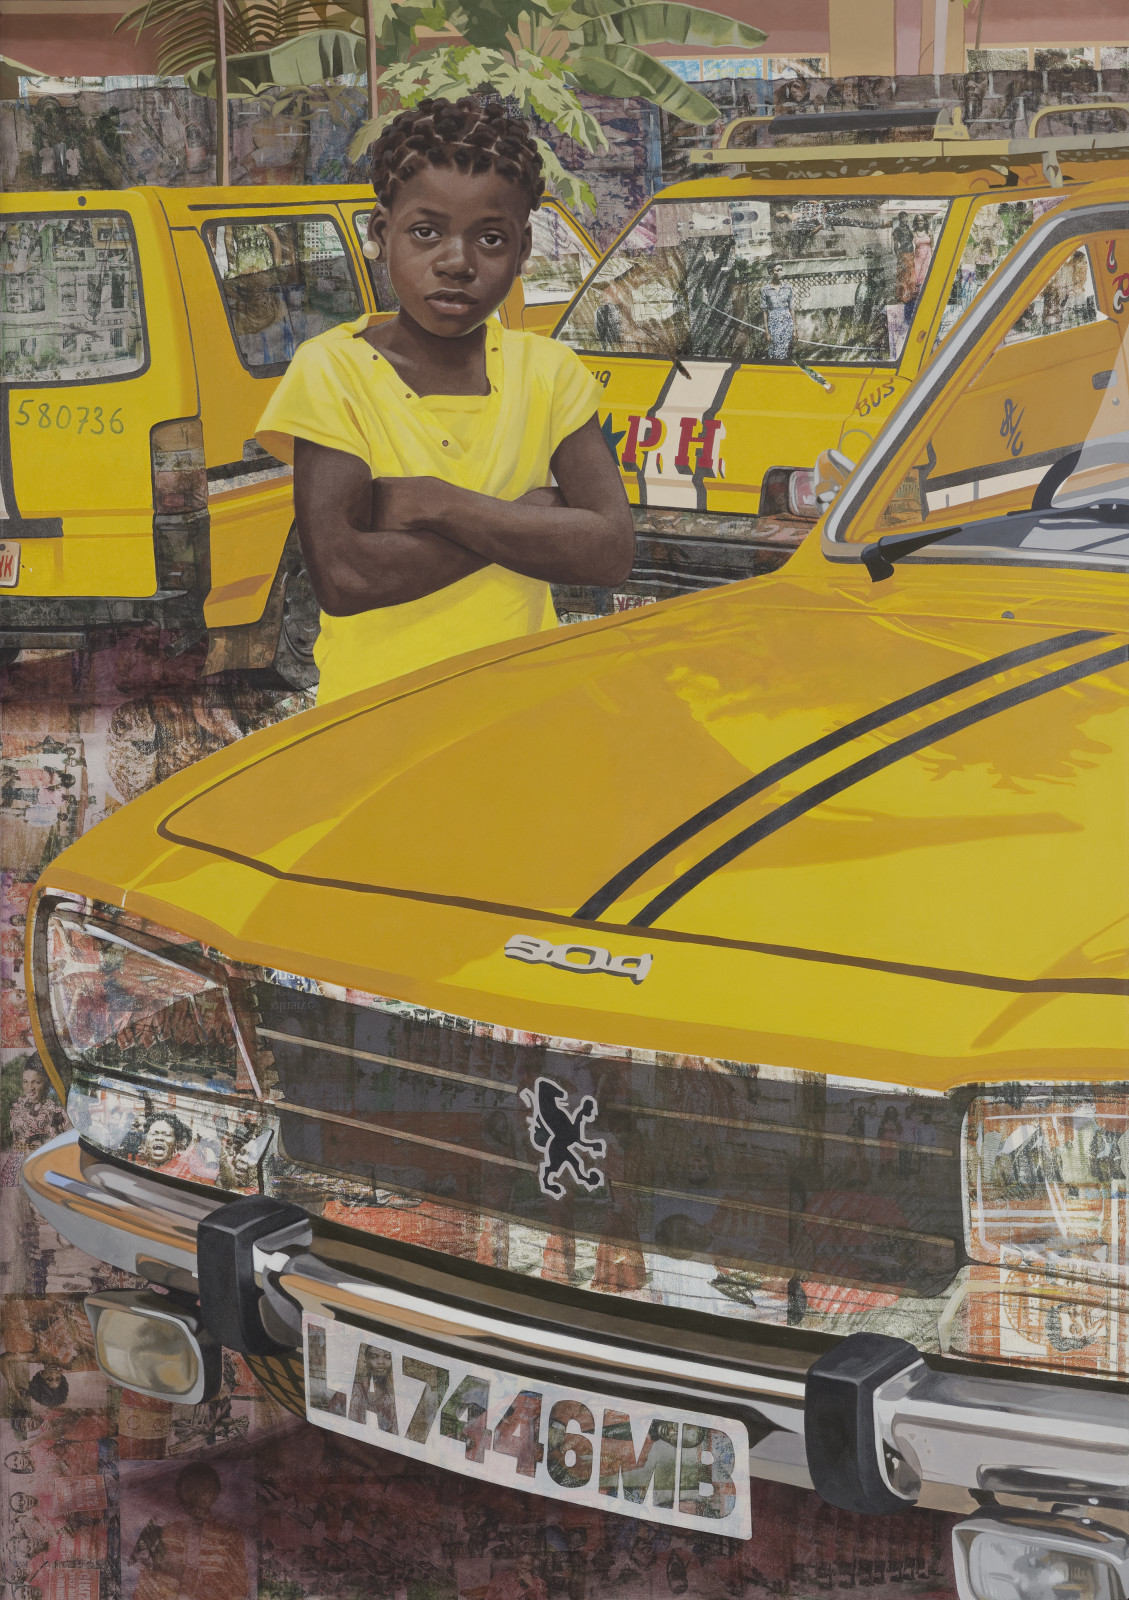 Njideka Akunyili Crosby, The Beautyful Ones Series #7, 2018. © Njideka Akunyili Crosby, courtesy the artist, Victoria Miro, and David Zwirner